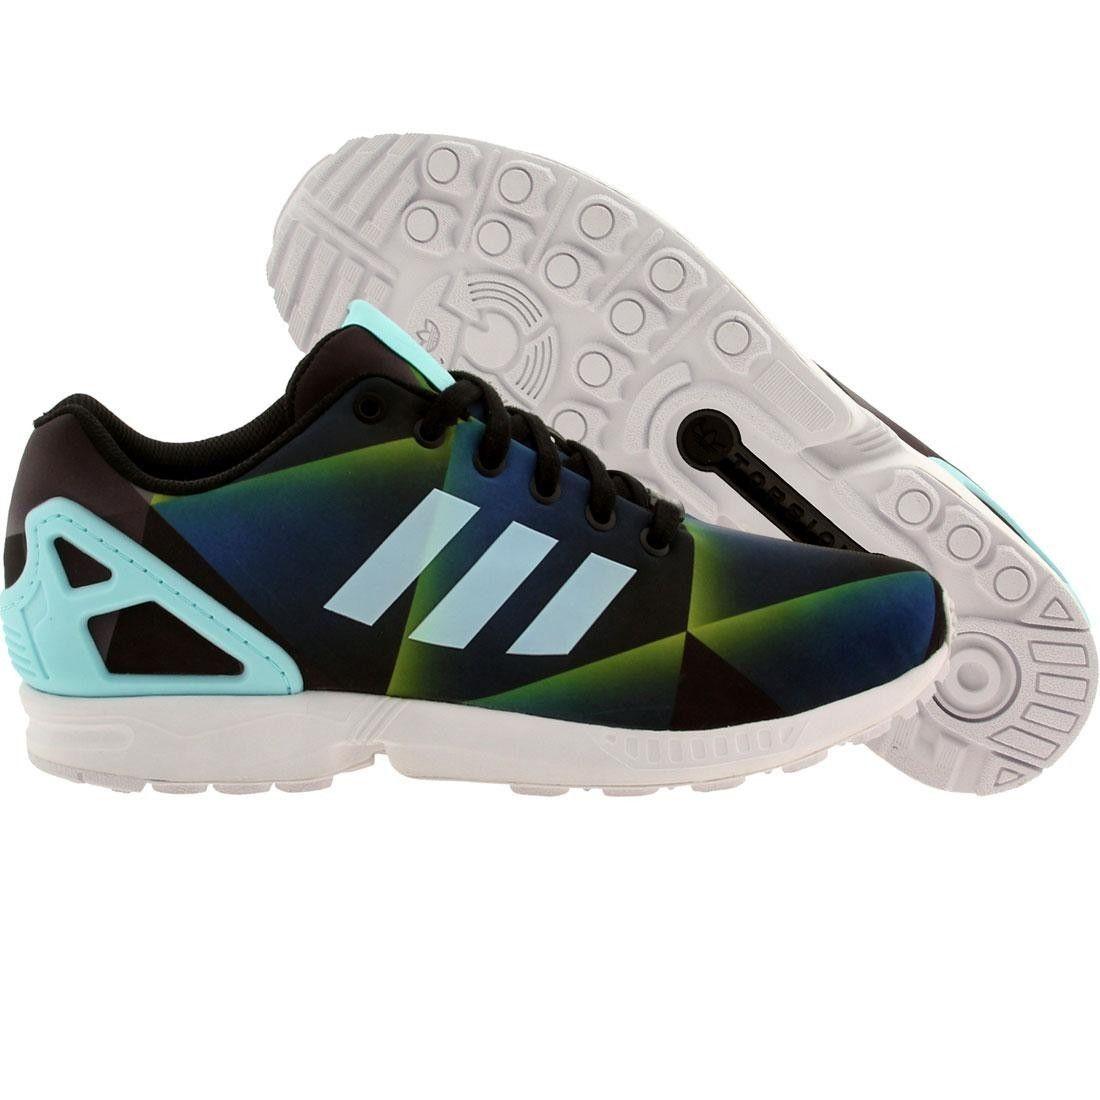 buy online 95c48 85b8c Adidas Originals ZX Flux  Geometric Corriendo Zapatos hombres B34516 Adidas  Originals Zx Flux